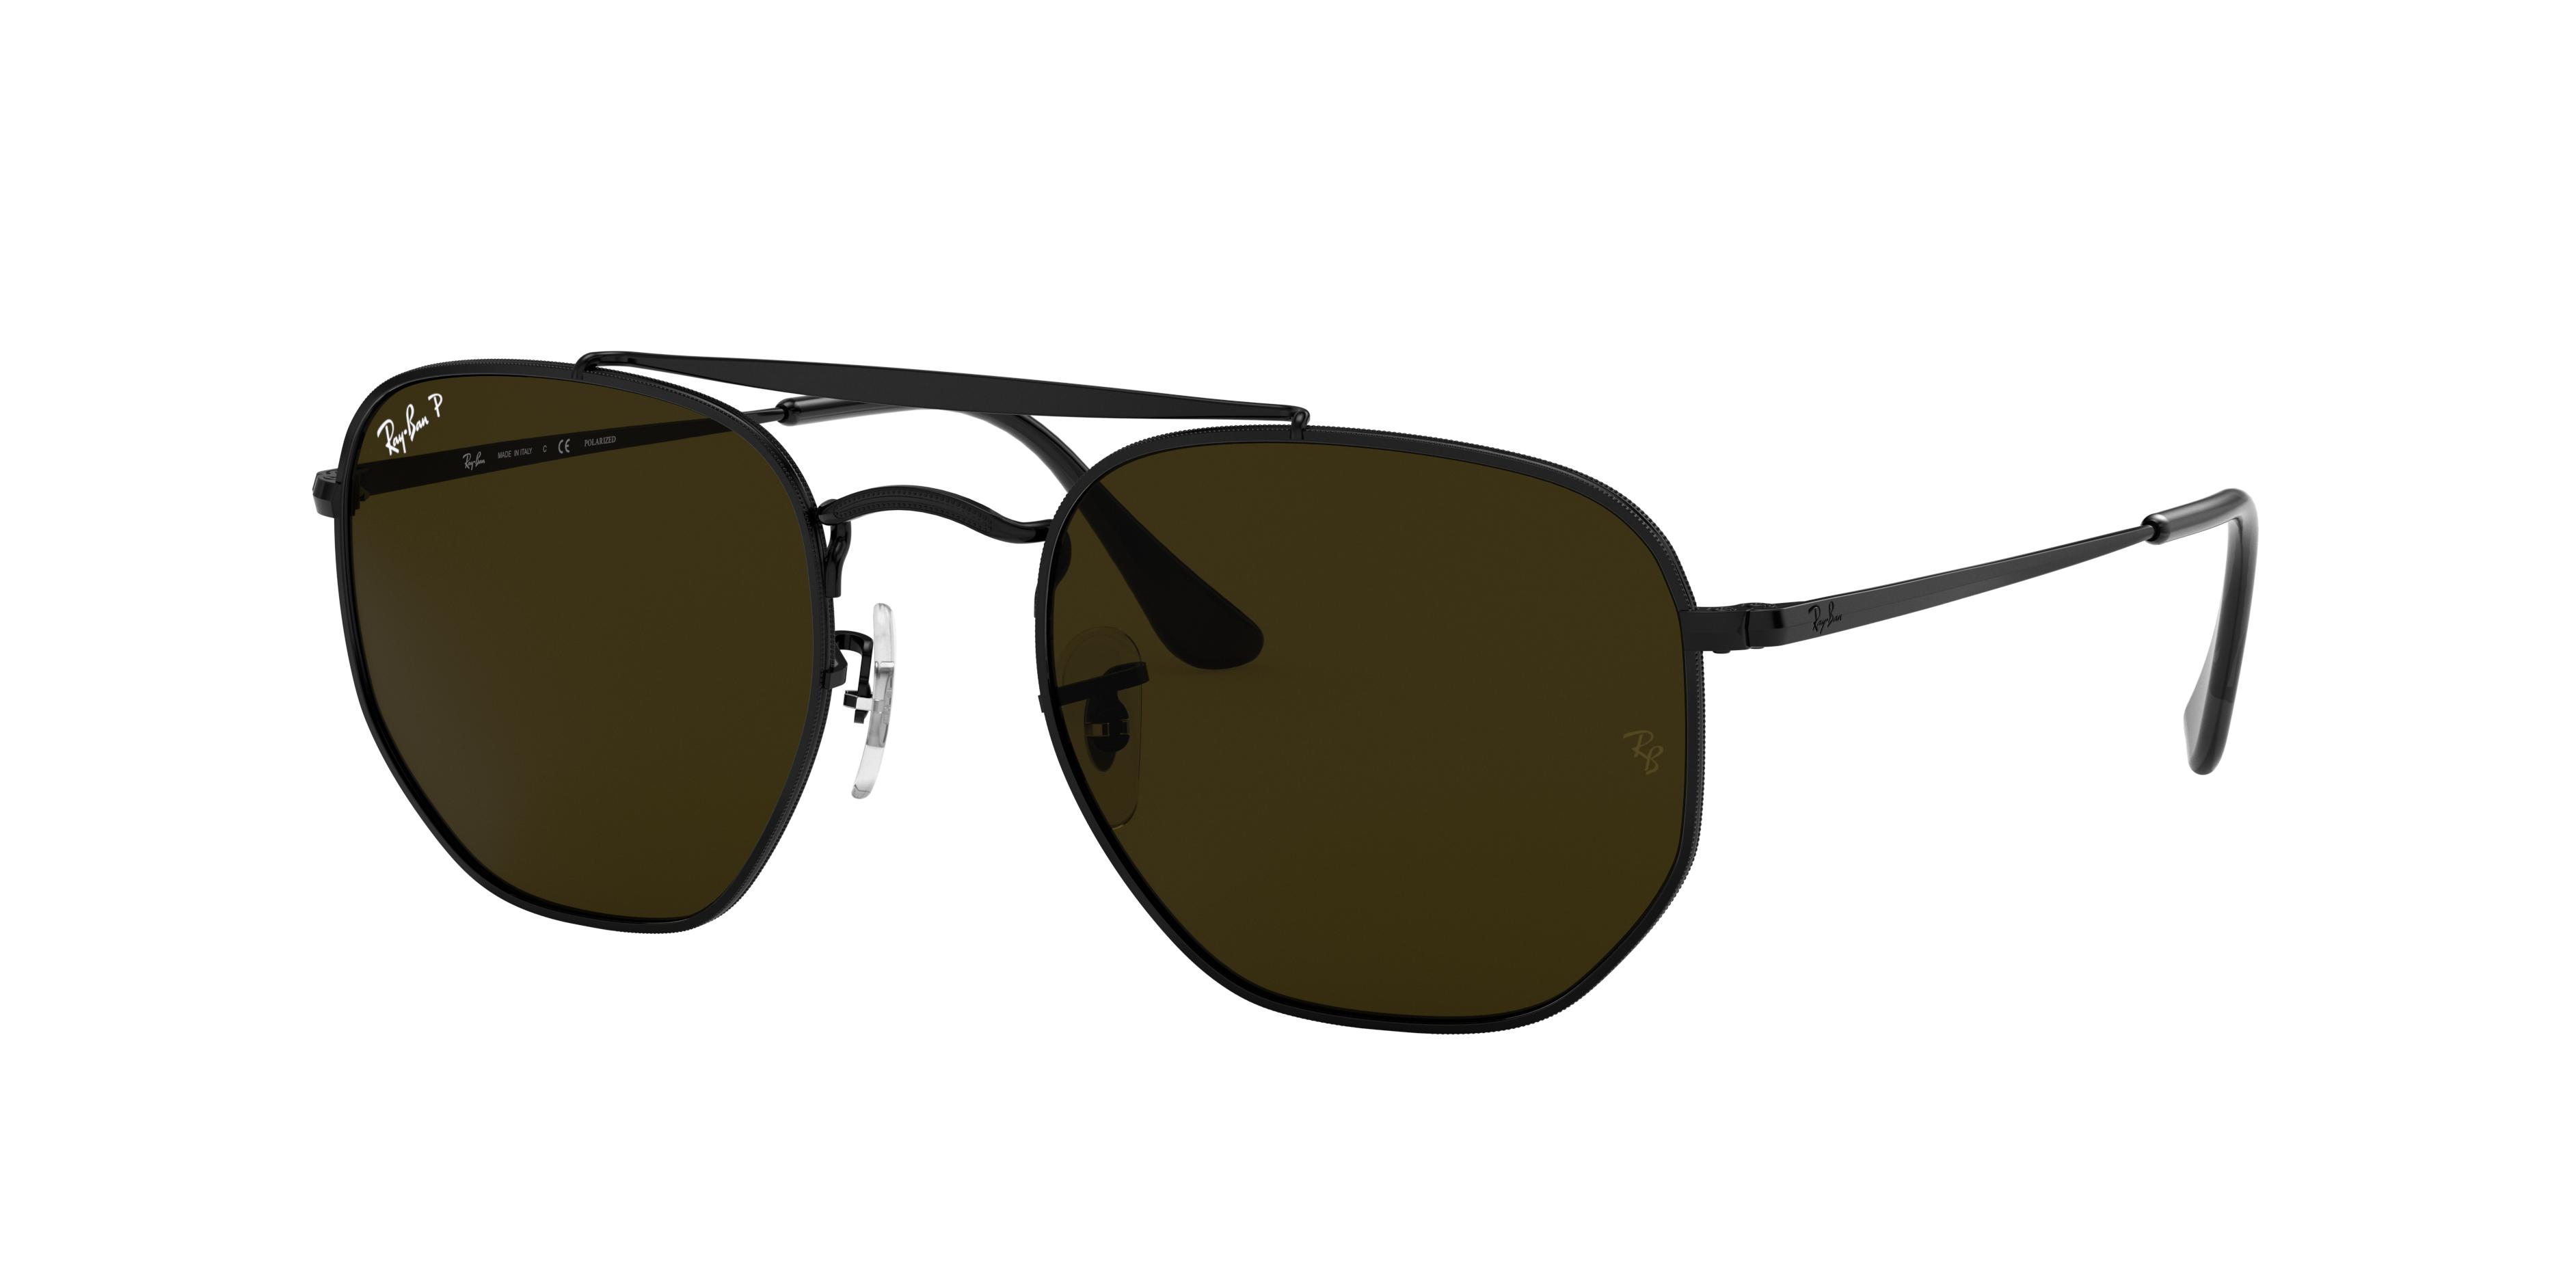 Ray-Ban Marshal Black, Polarized Green Lenses - RB3648